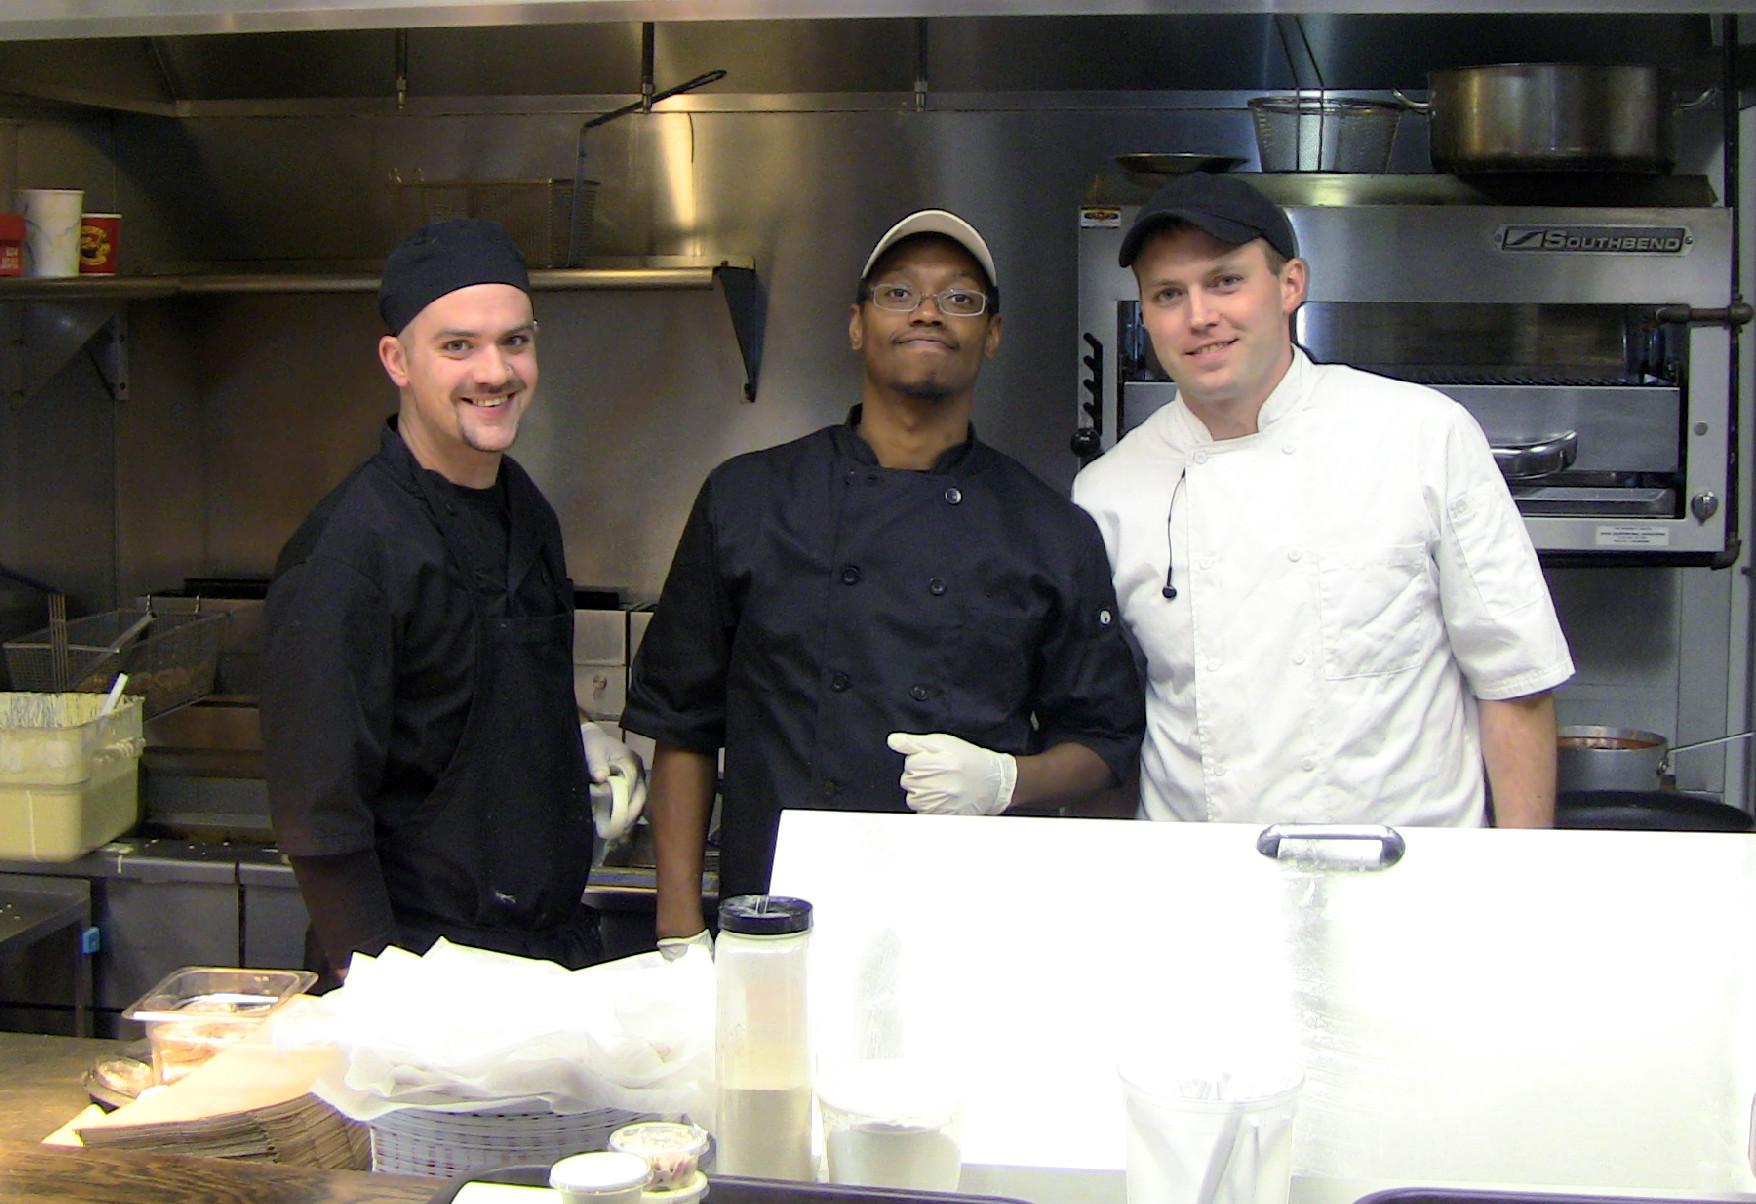 88eca51397ddb4eff474_Chipper_chefs.jpg